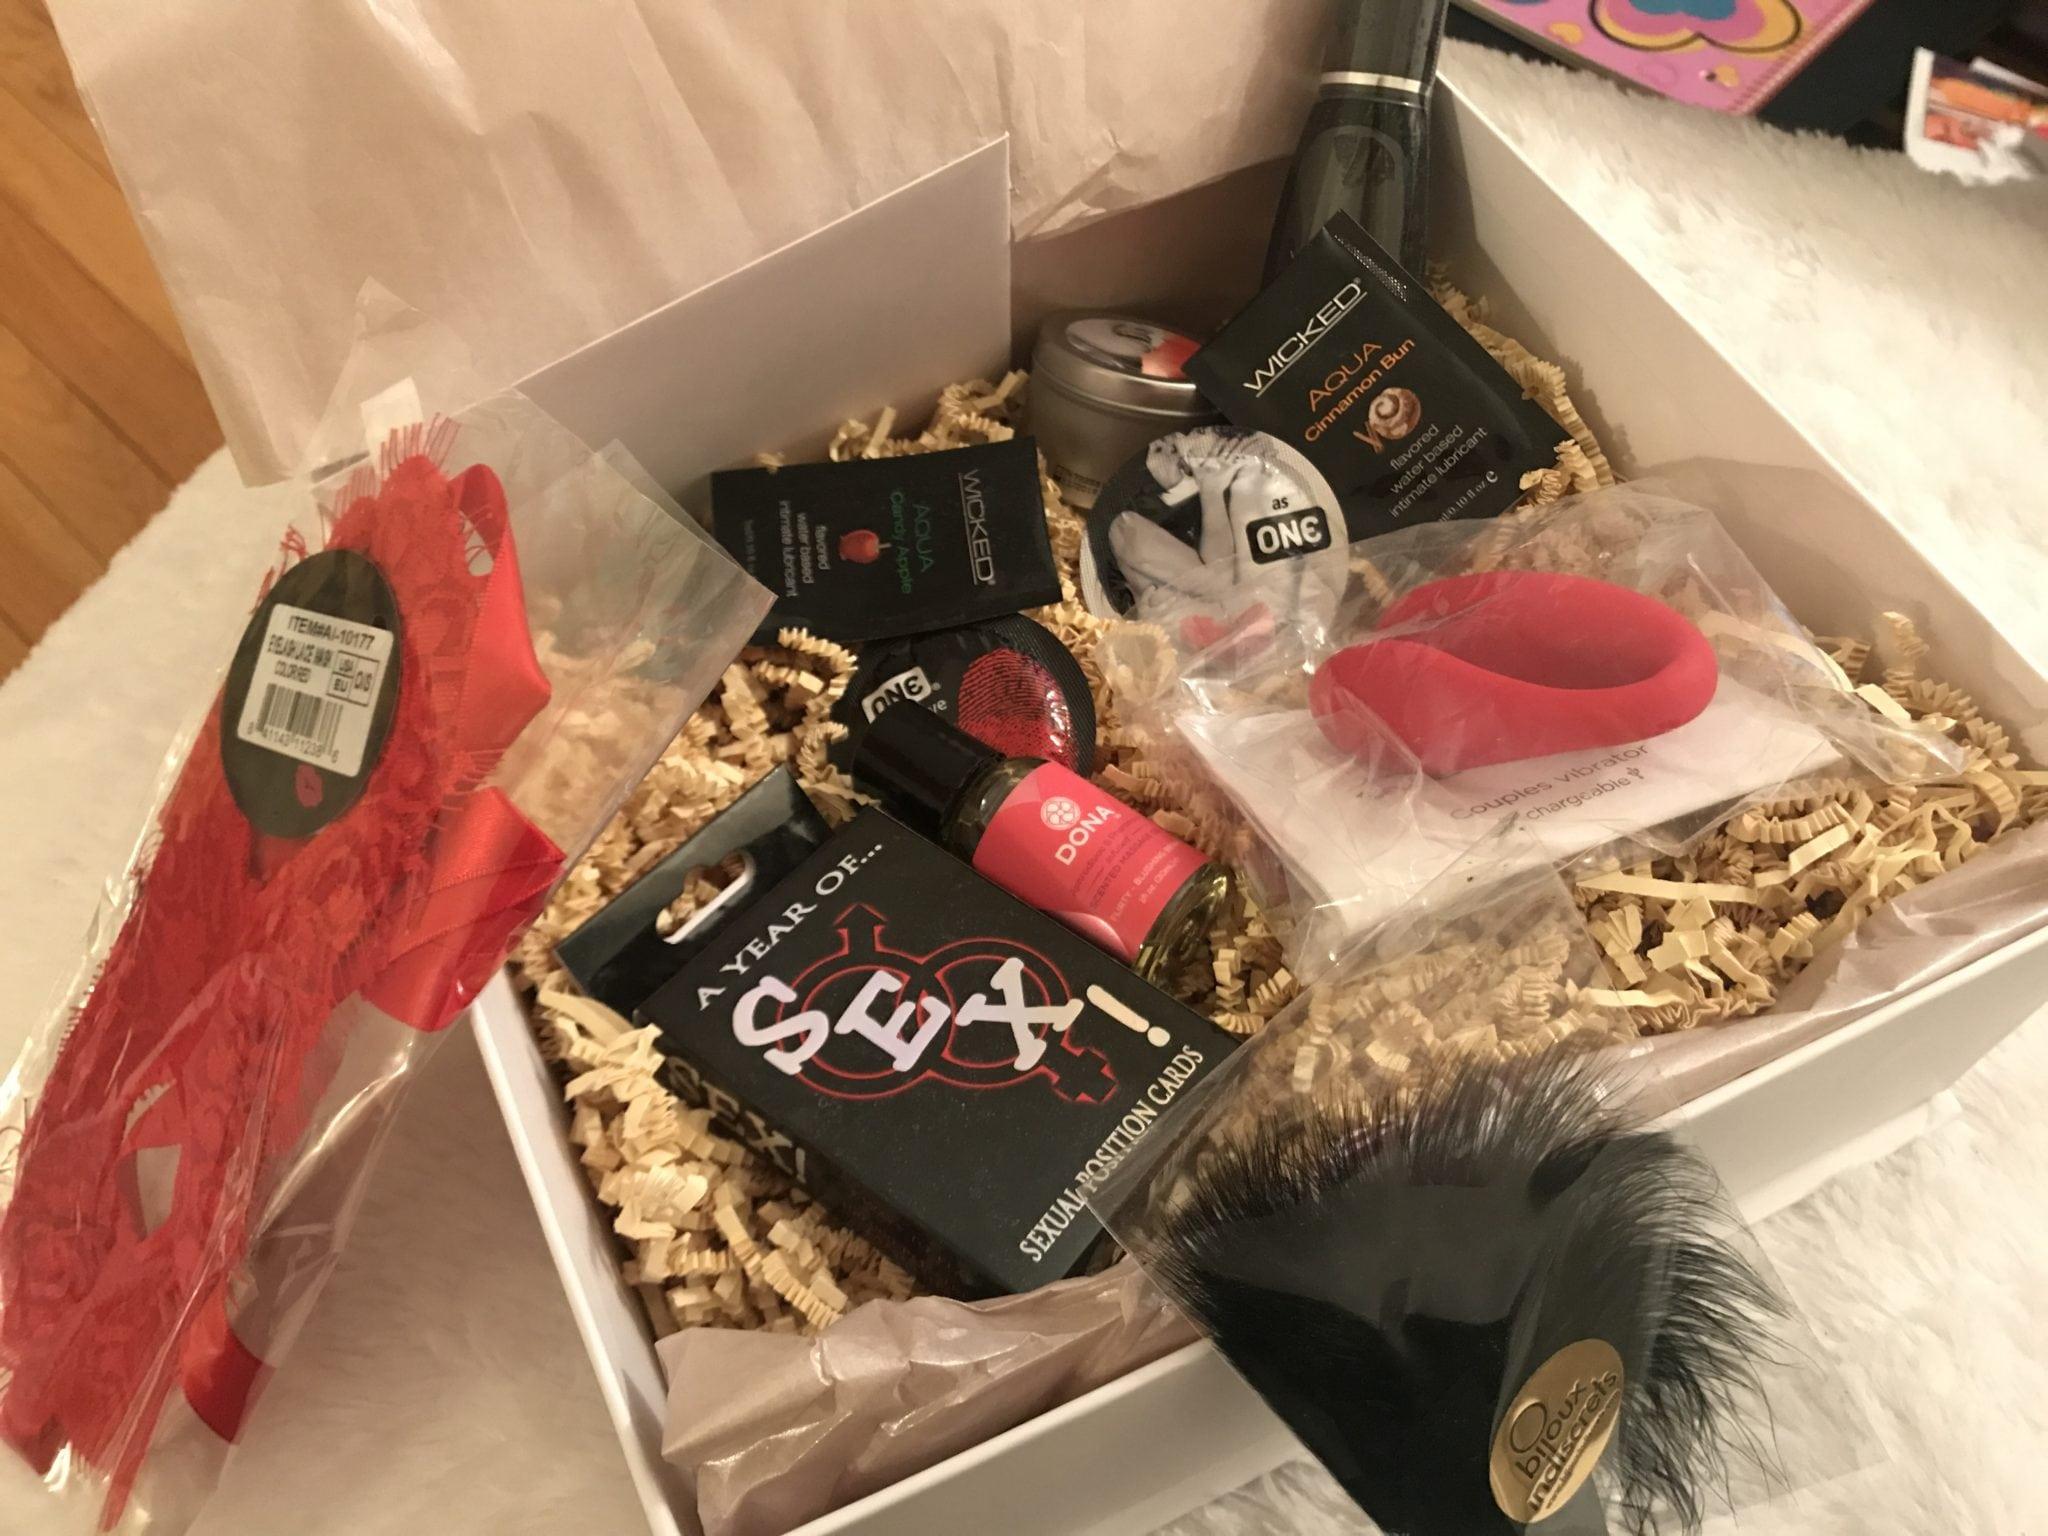 Ella Paradis UR Pleasure Gift Box Review